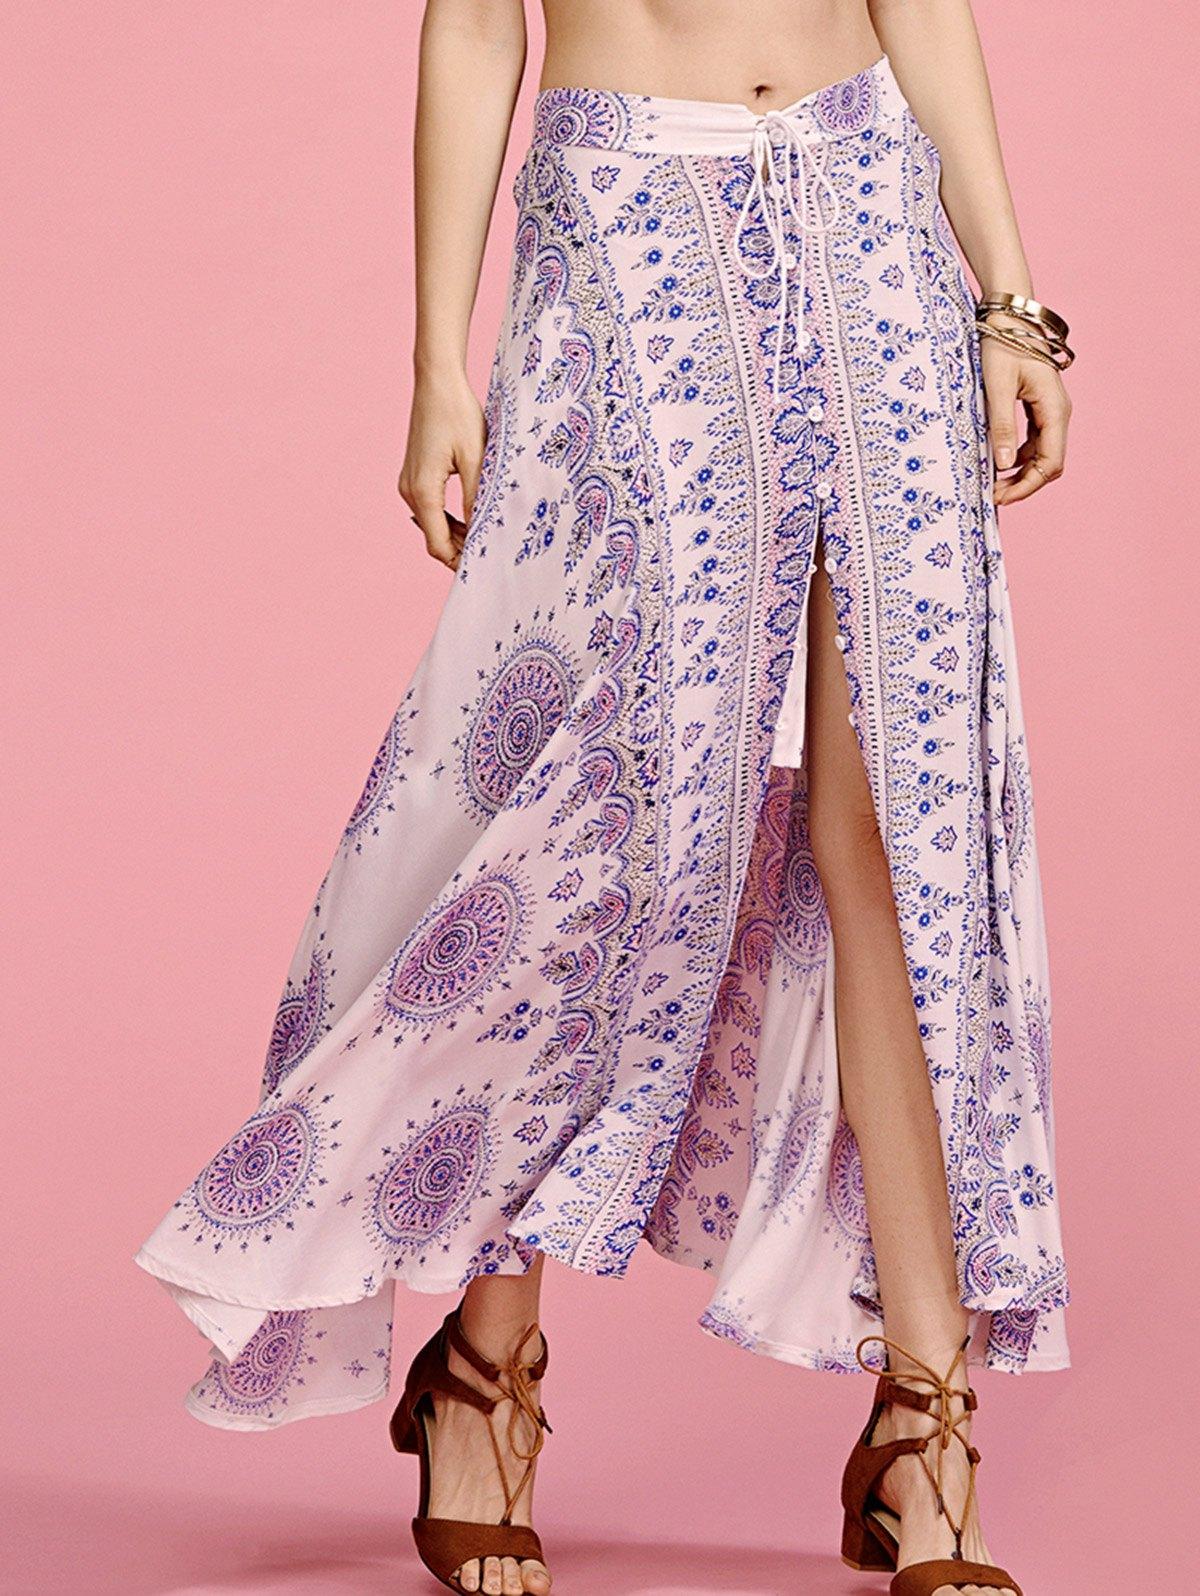 High Waisted Ethnic Print Slit Skirt